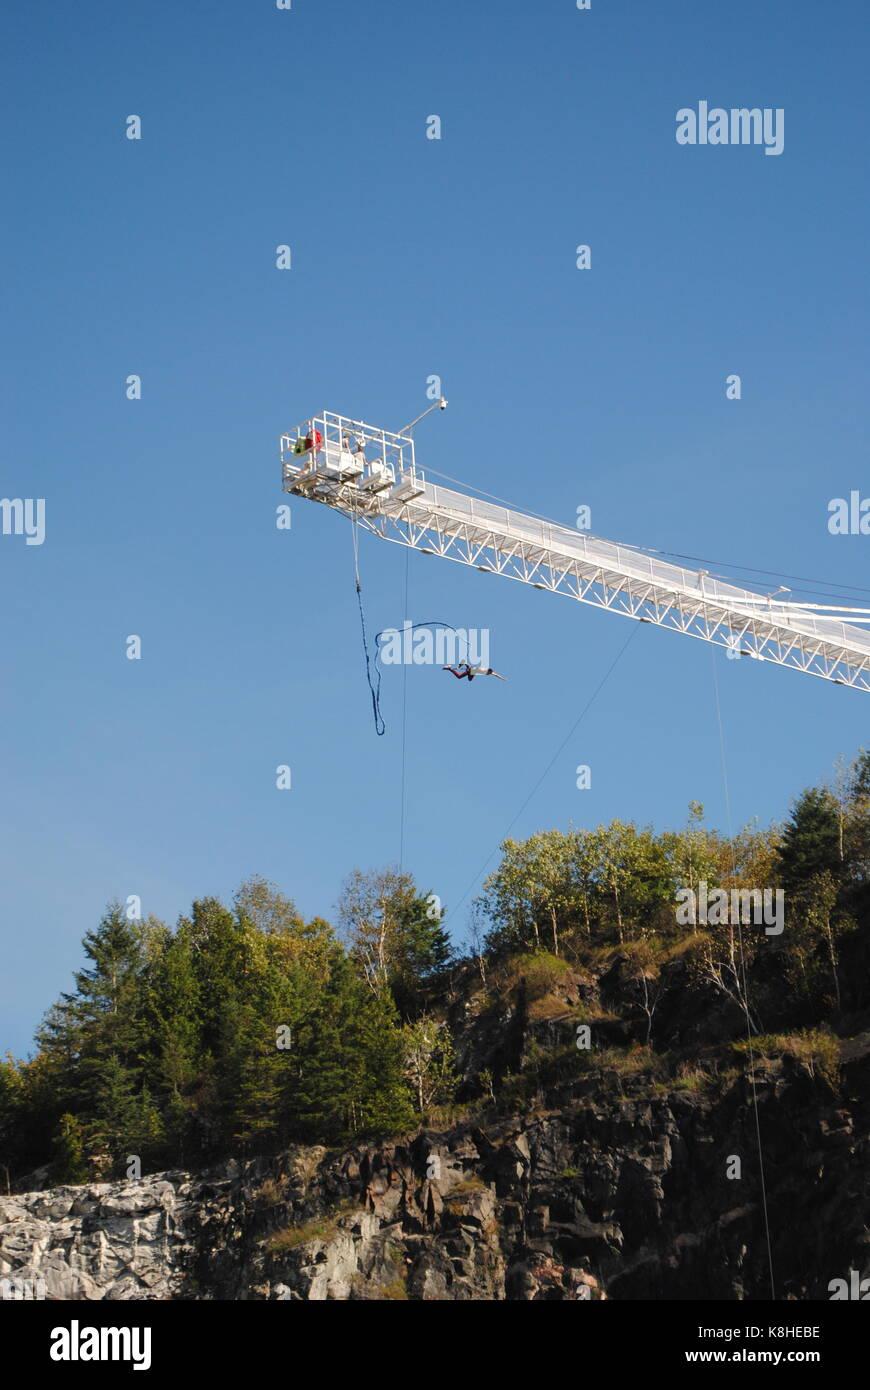 Bungee Jump - Stock Image